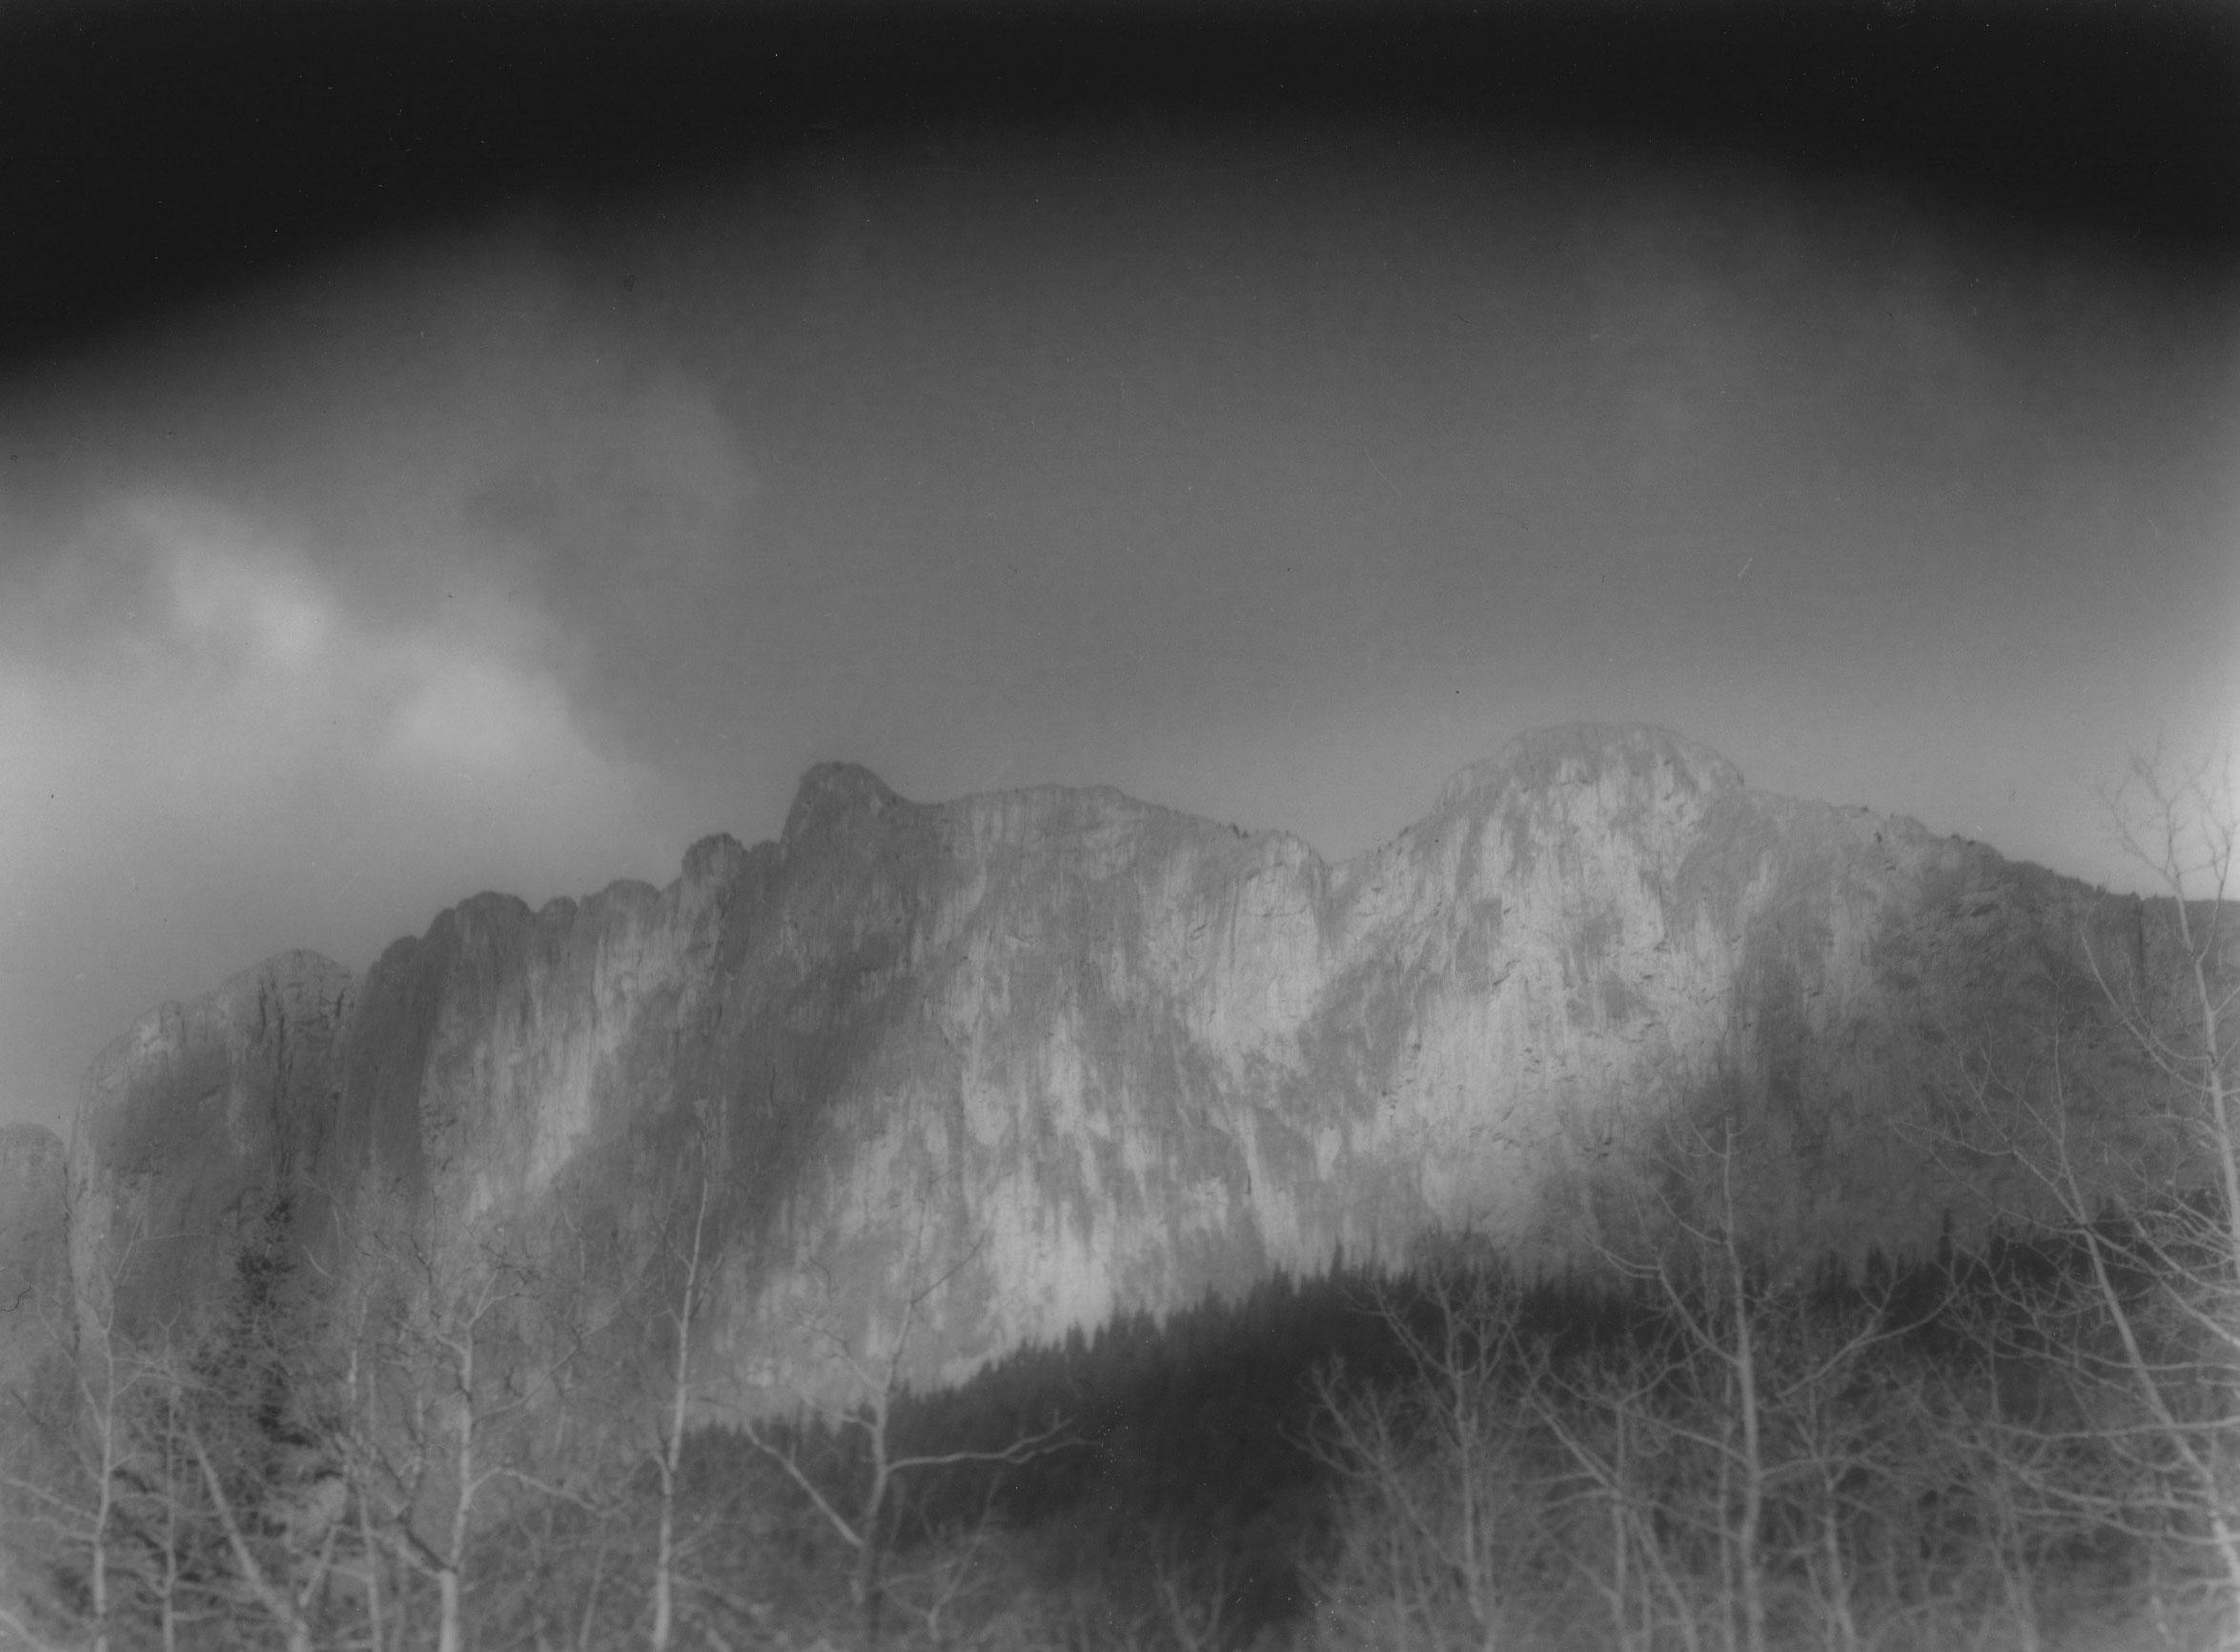 Mount Yamnuska, AB, Canada